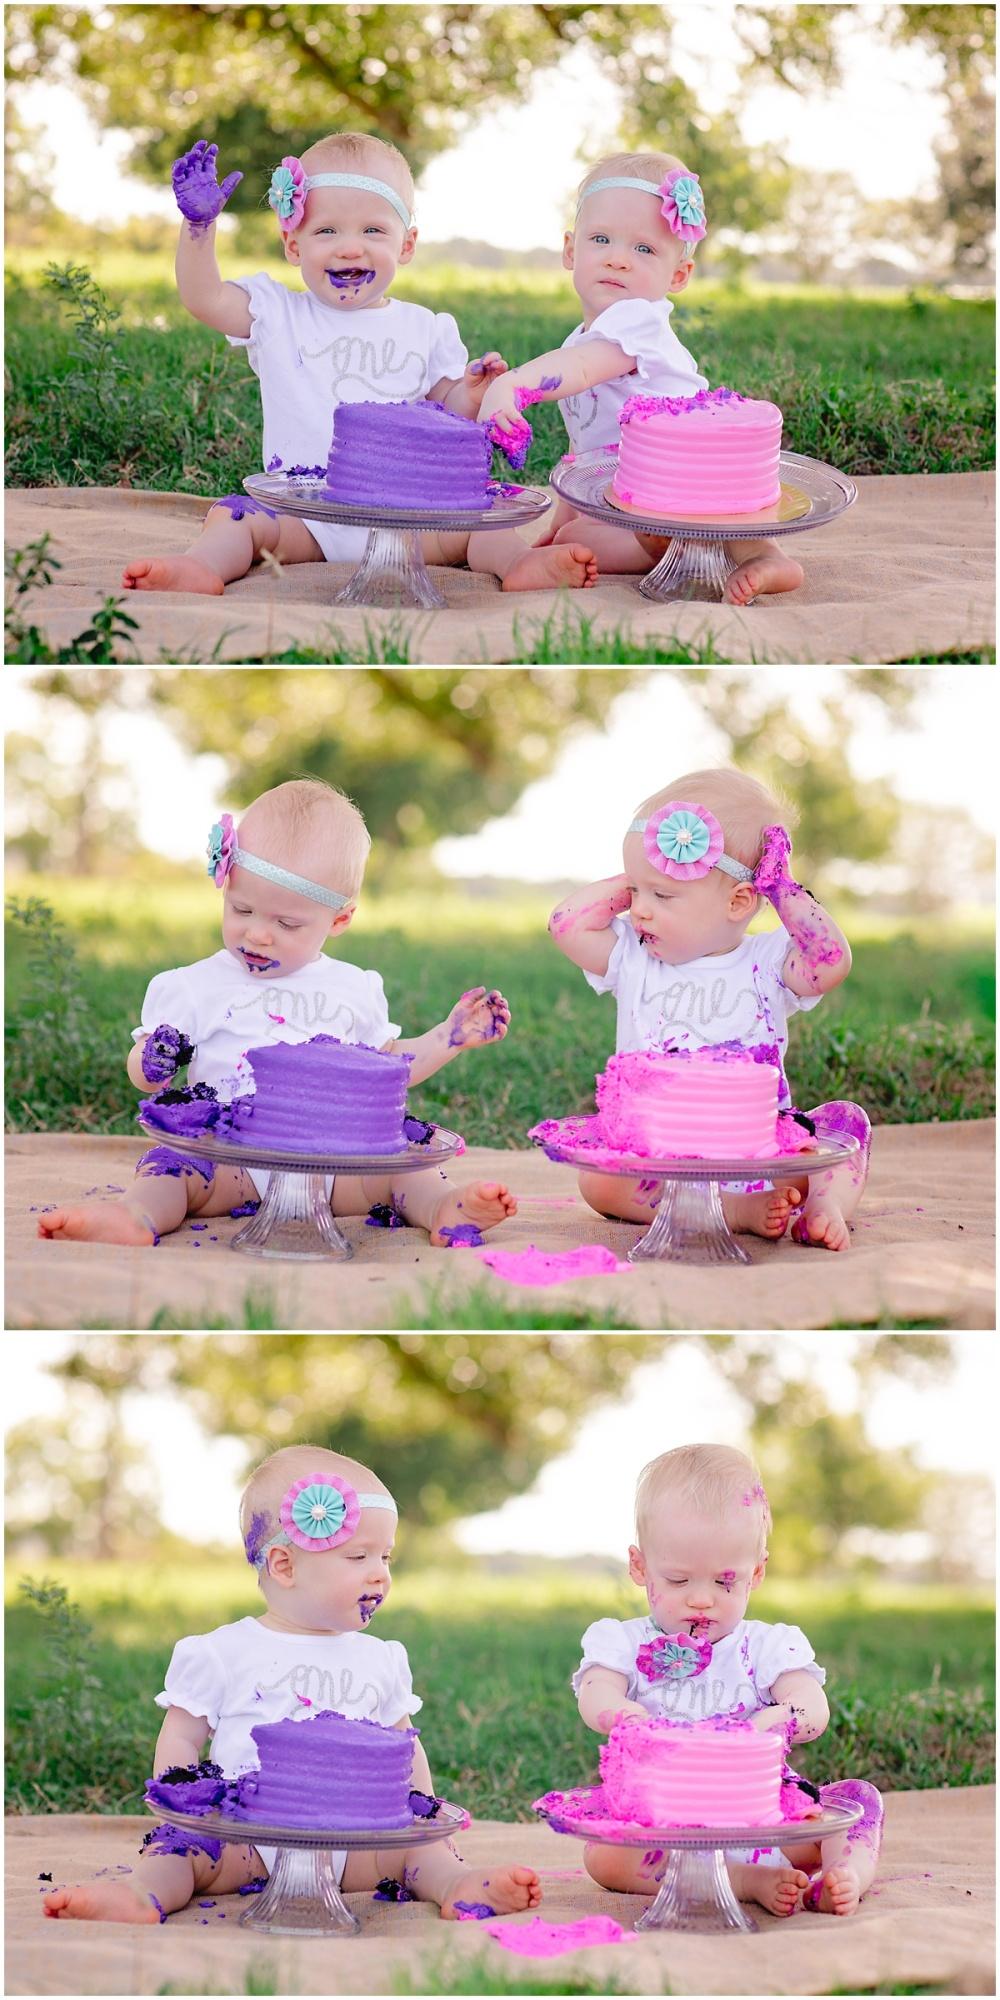 Family-Children-Portraits-Cake-Smash-Photos-San-Antonio-Hill-Country-Texas-Carly-Barton-Photography_0015.jpg